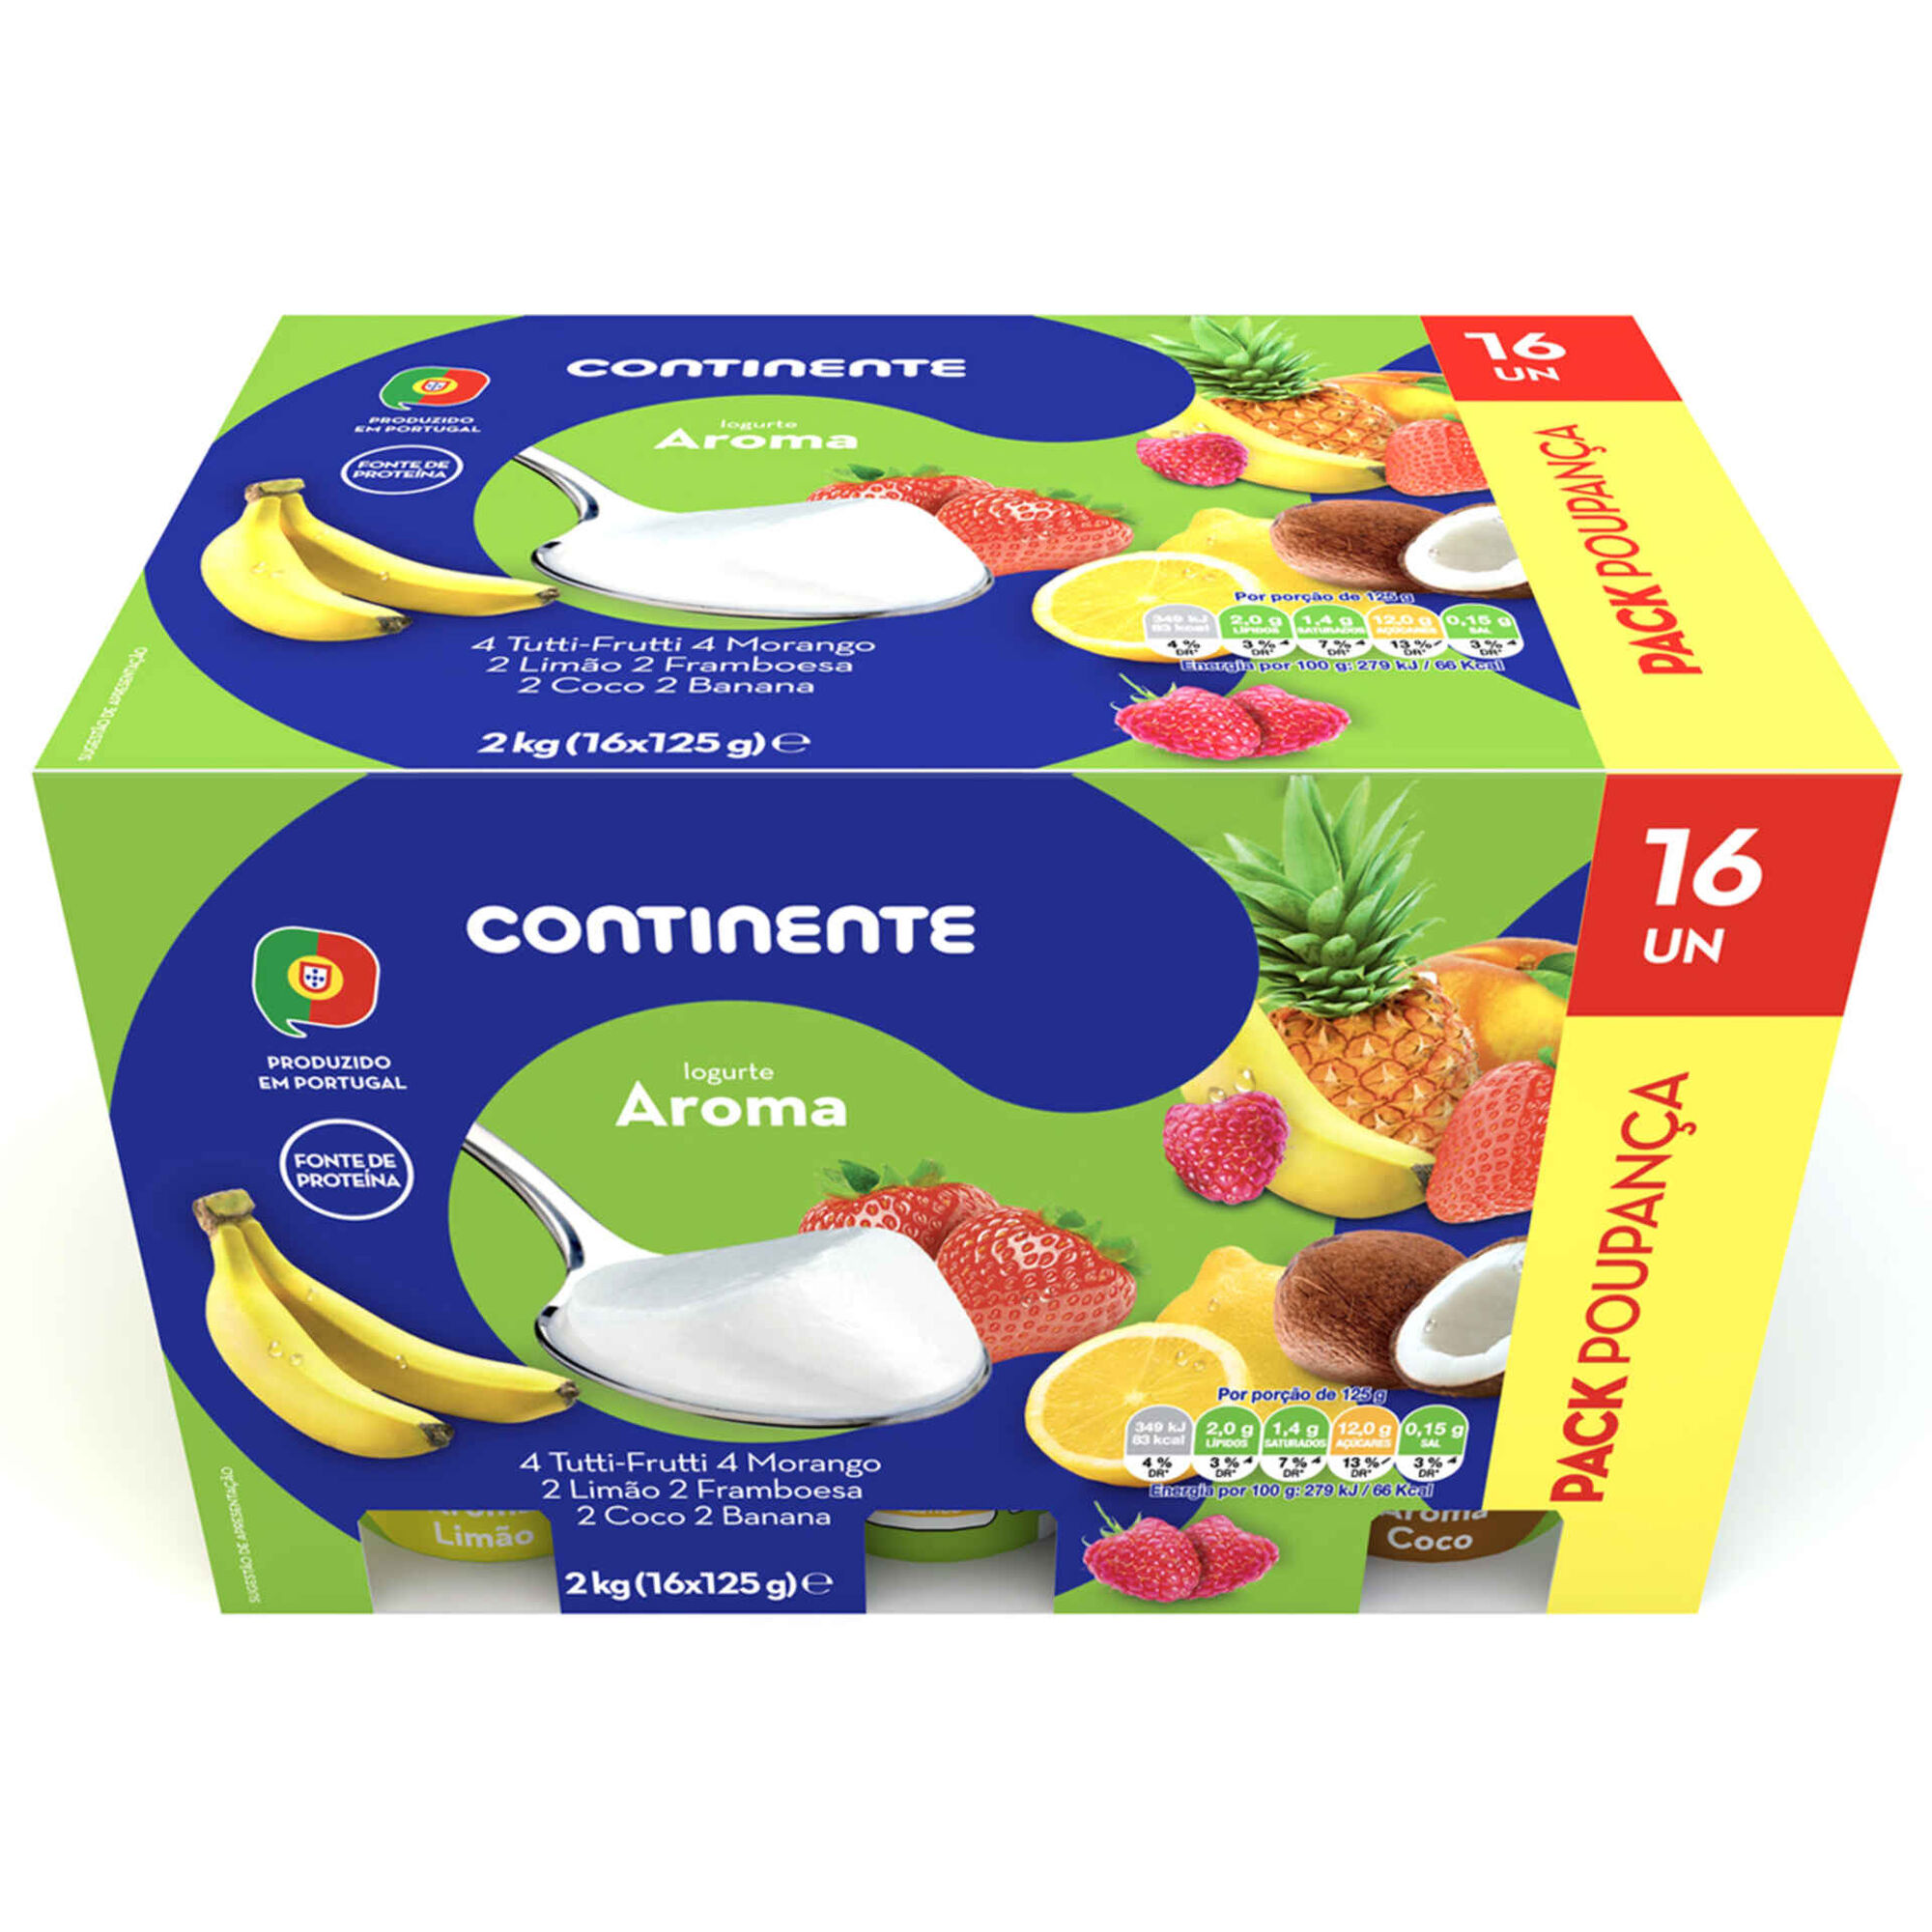 Iogurte Aroma Tutti Frutti, Morango, Limão, Framboesa, Coco e Banana Pack Poupança